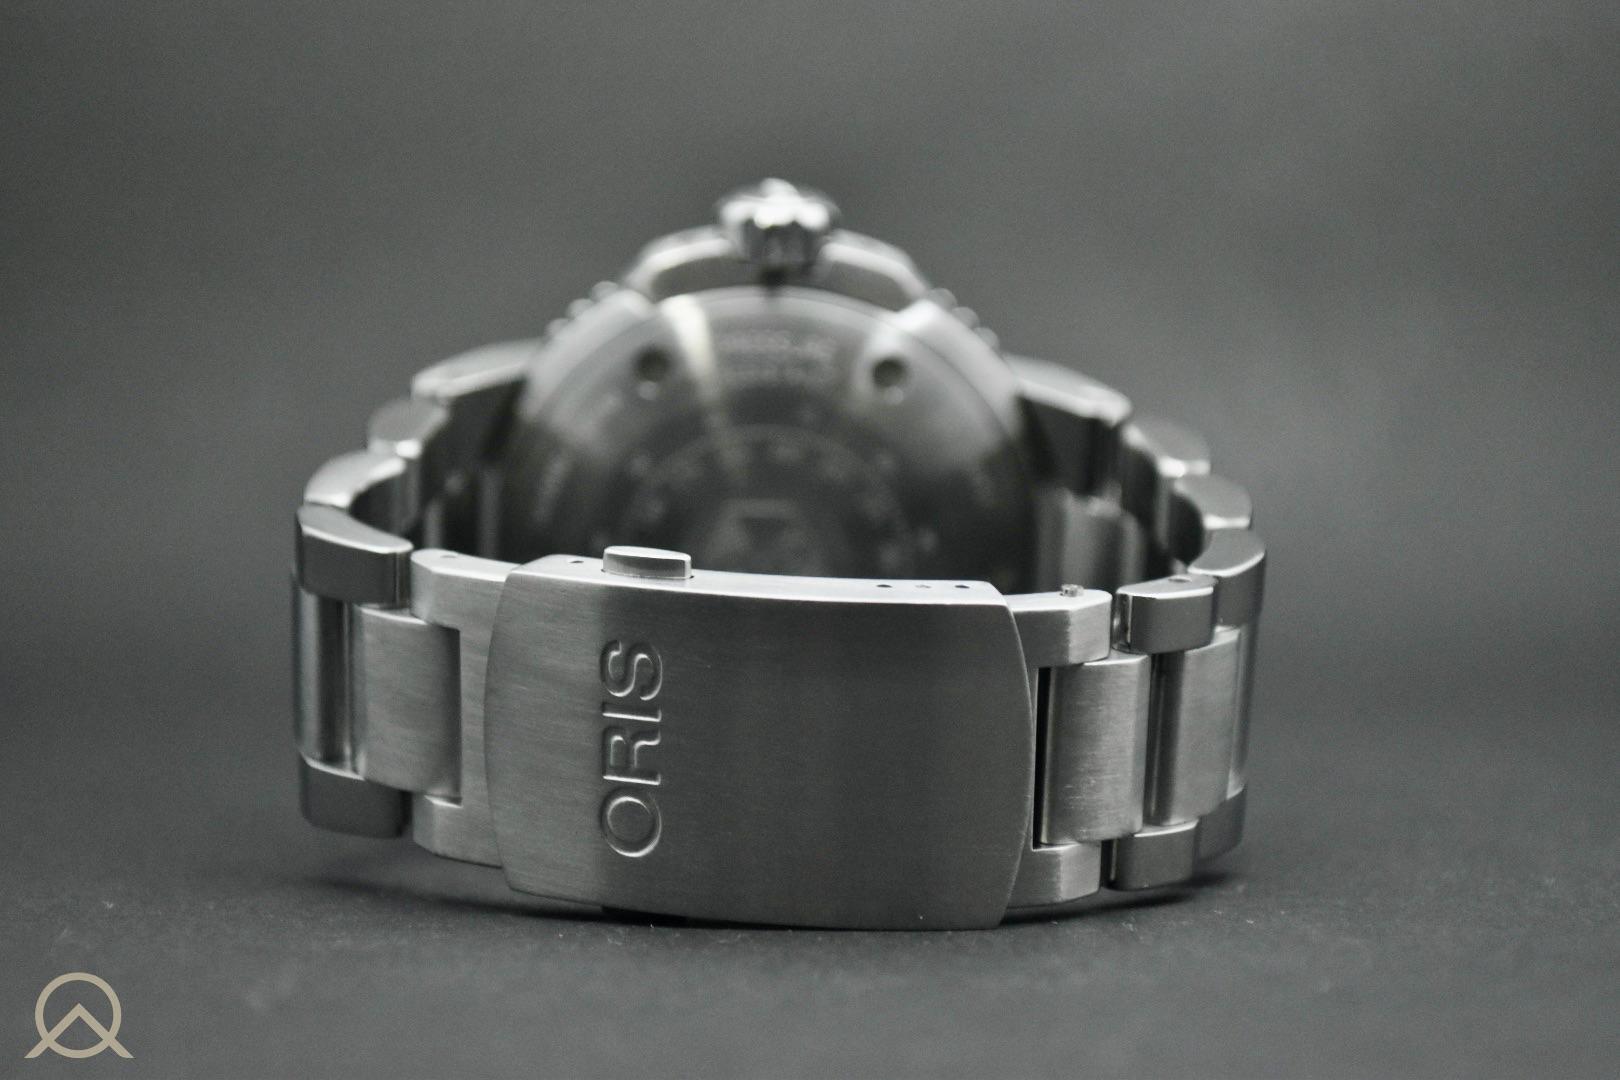 Oris Aquis Small Seconds Date